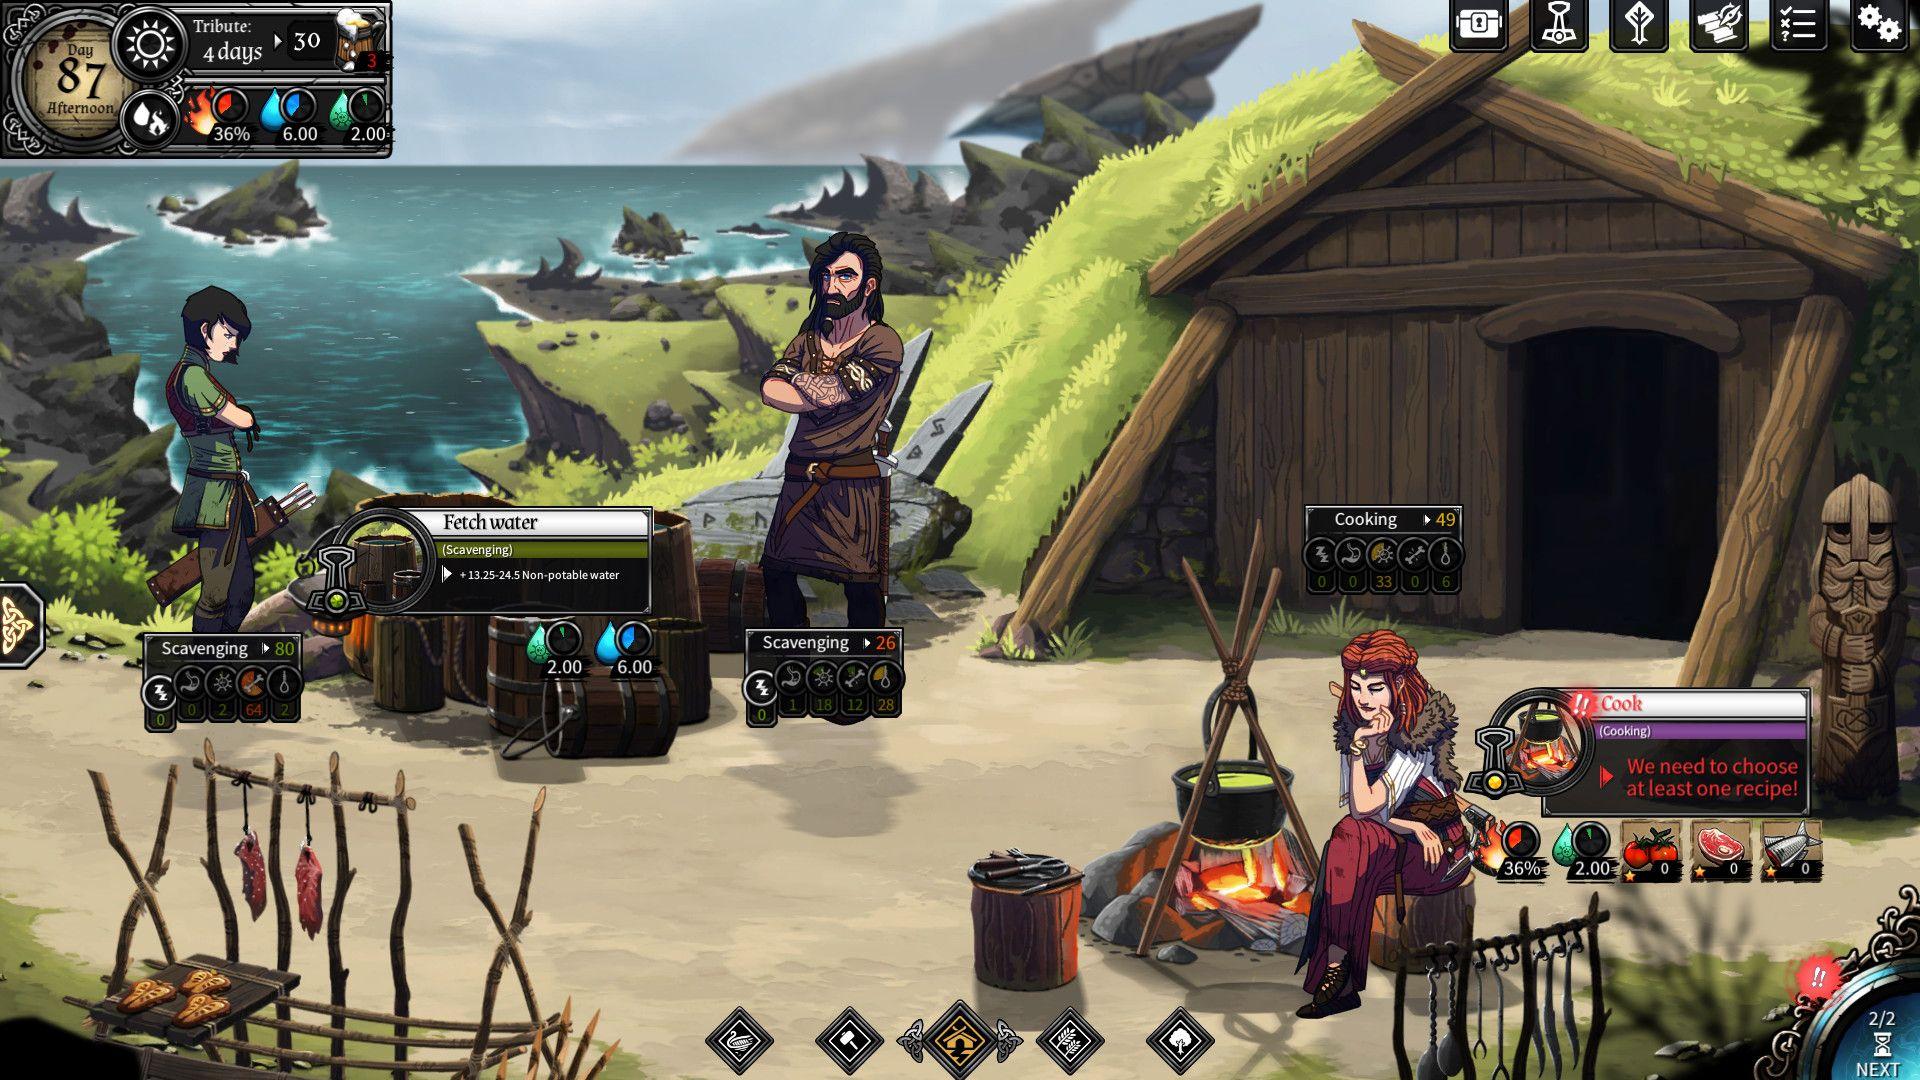 Dead In Vinland on Steam Adventure games, Rafting, Battle